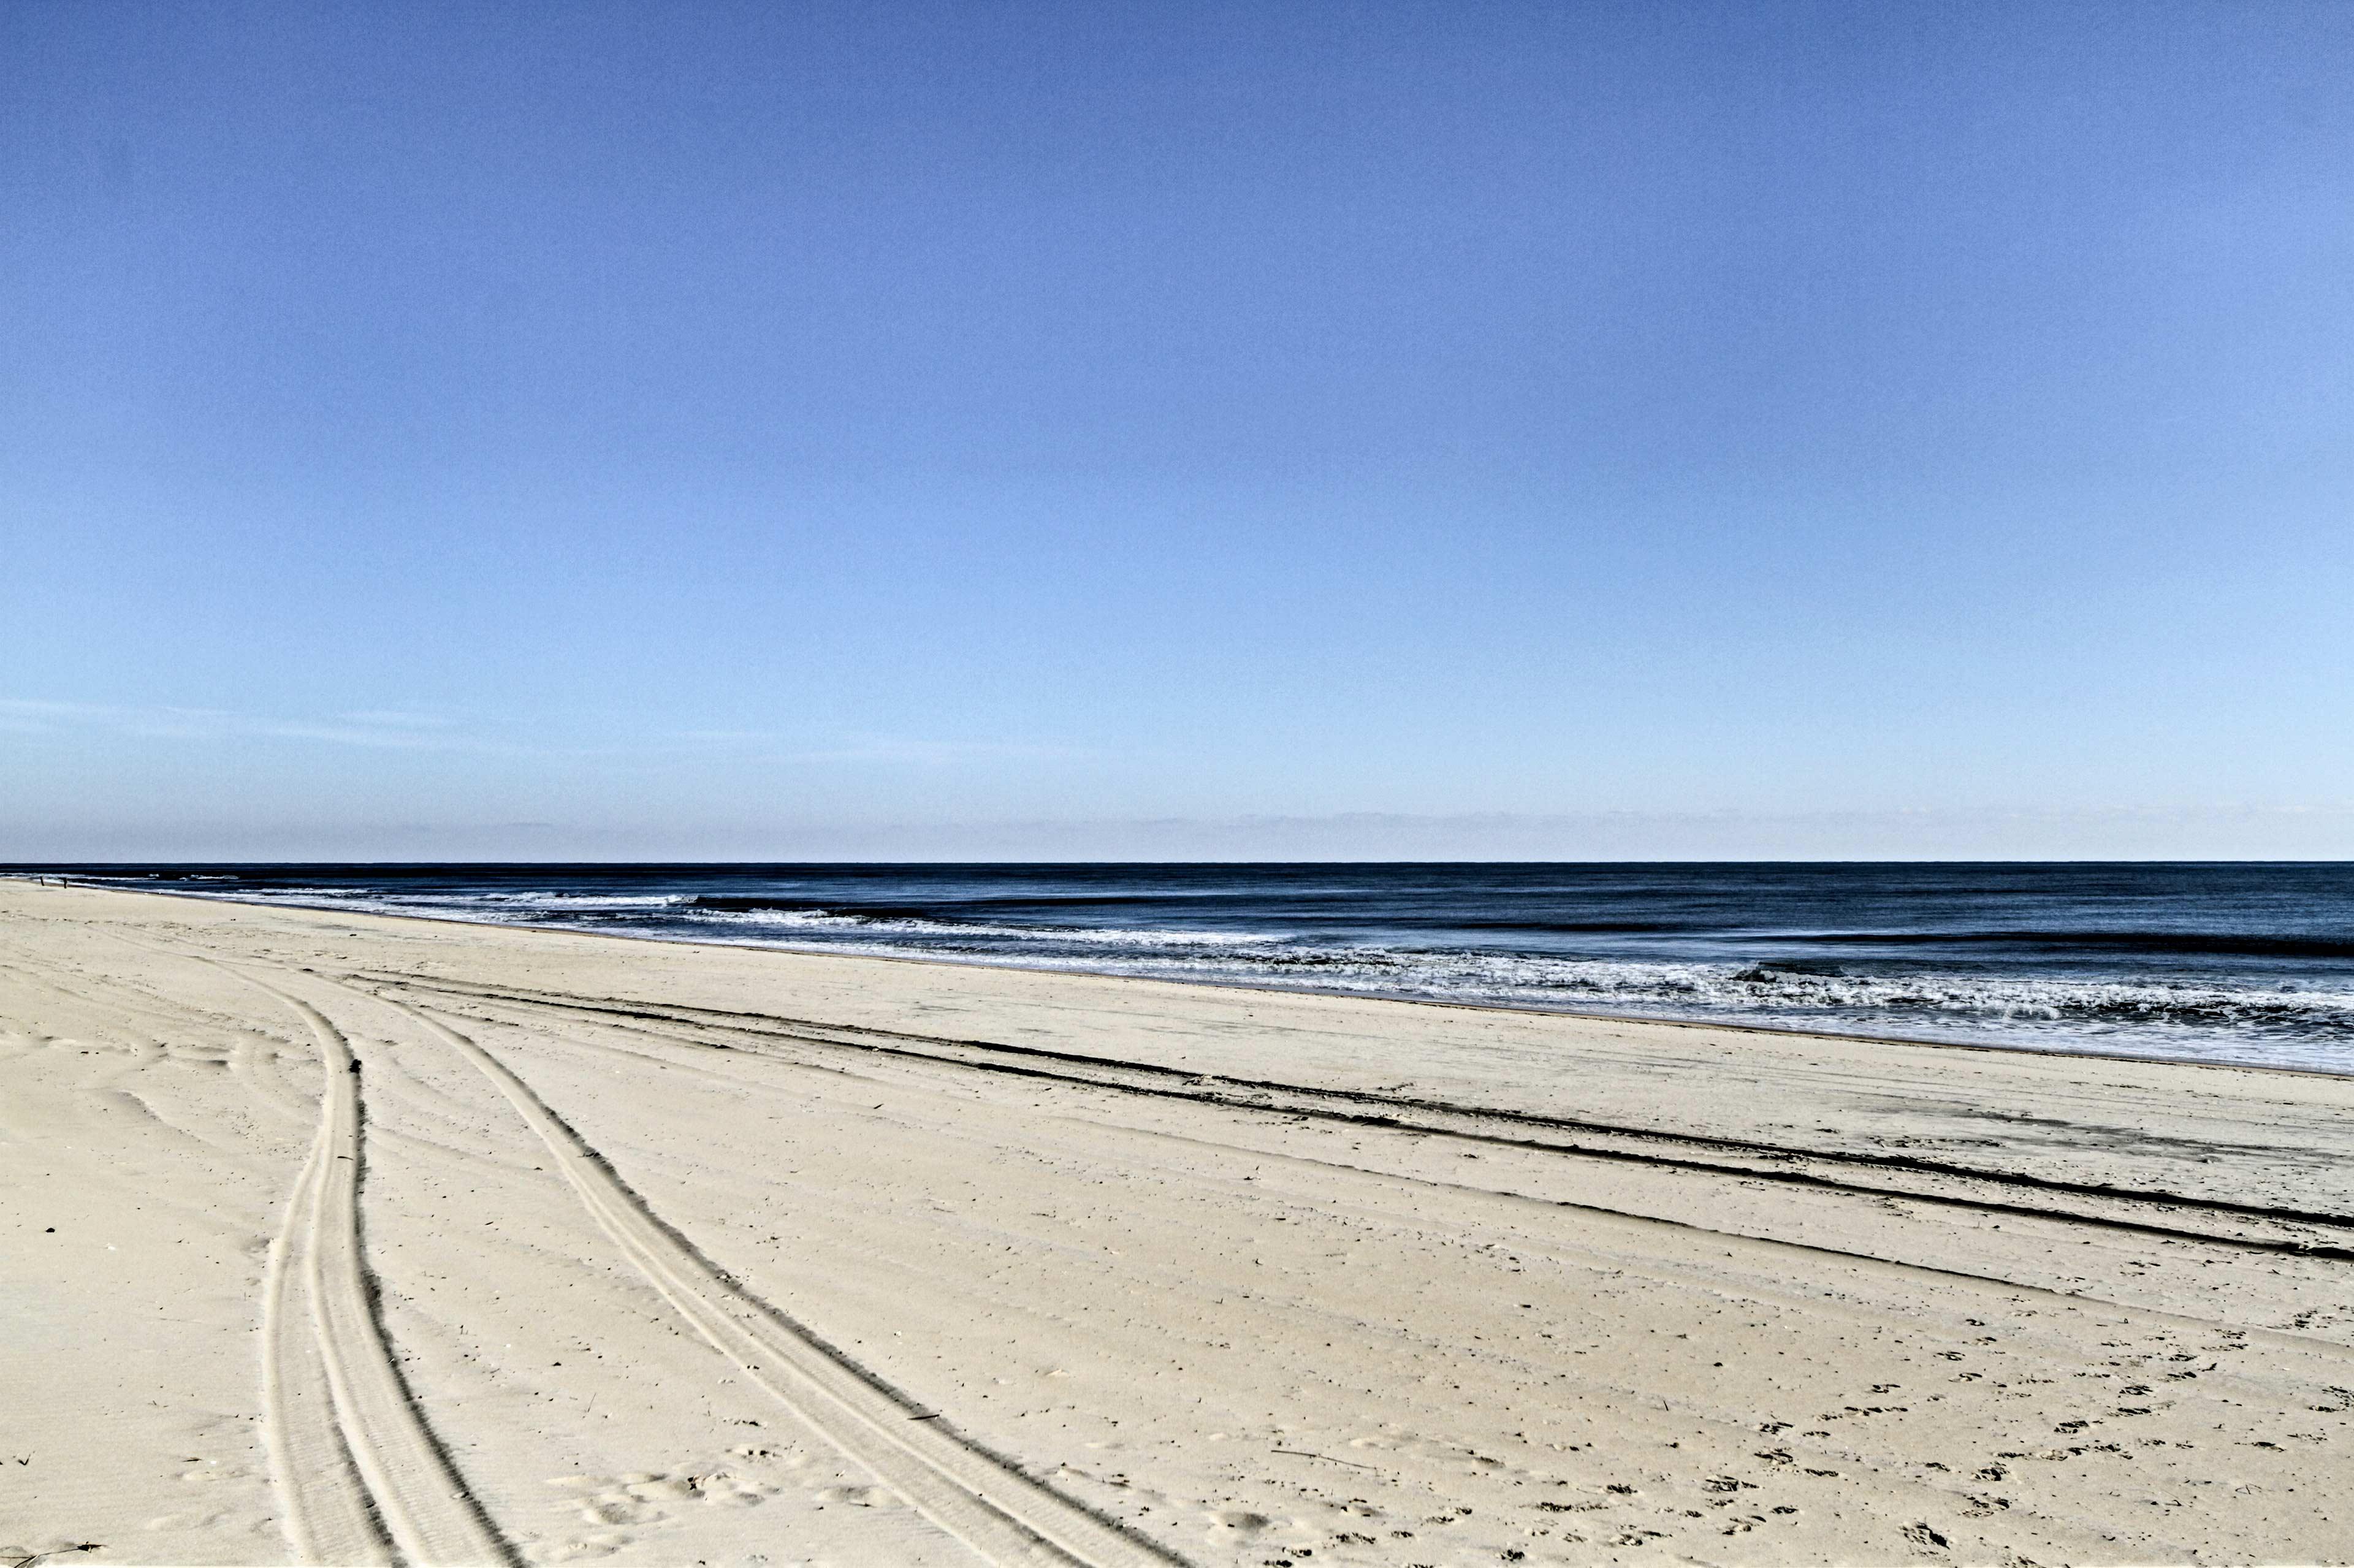 White sandy beaches await!